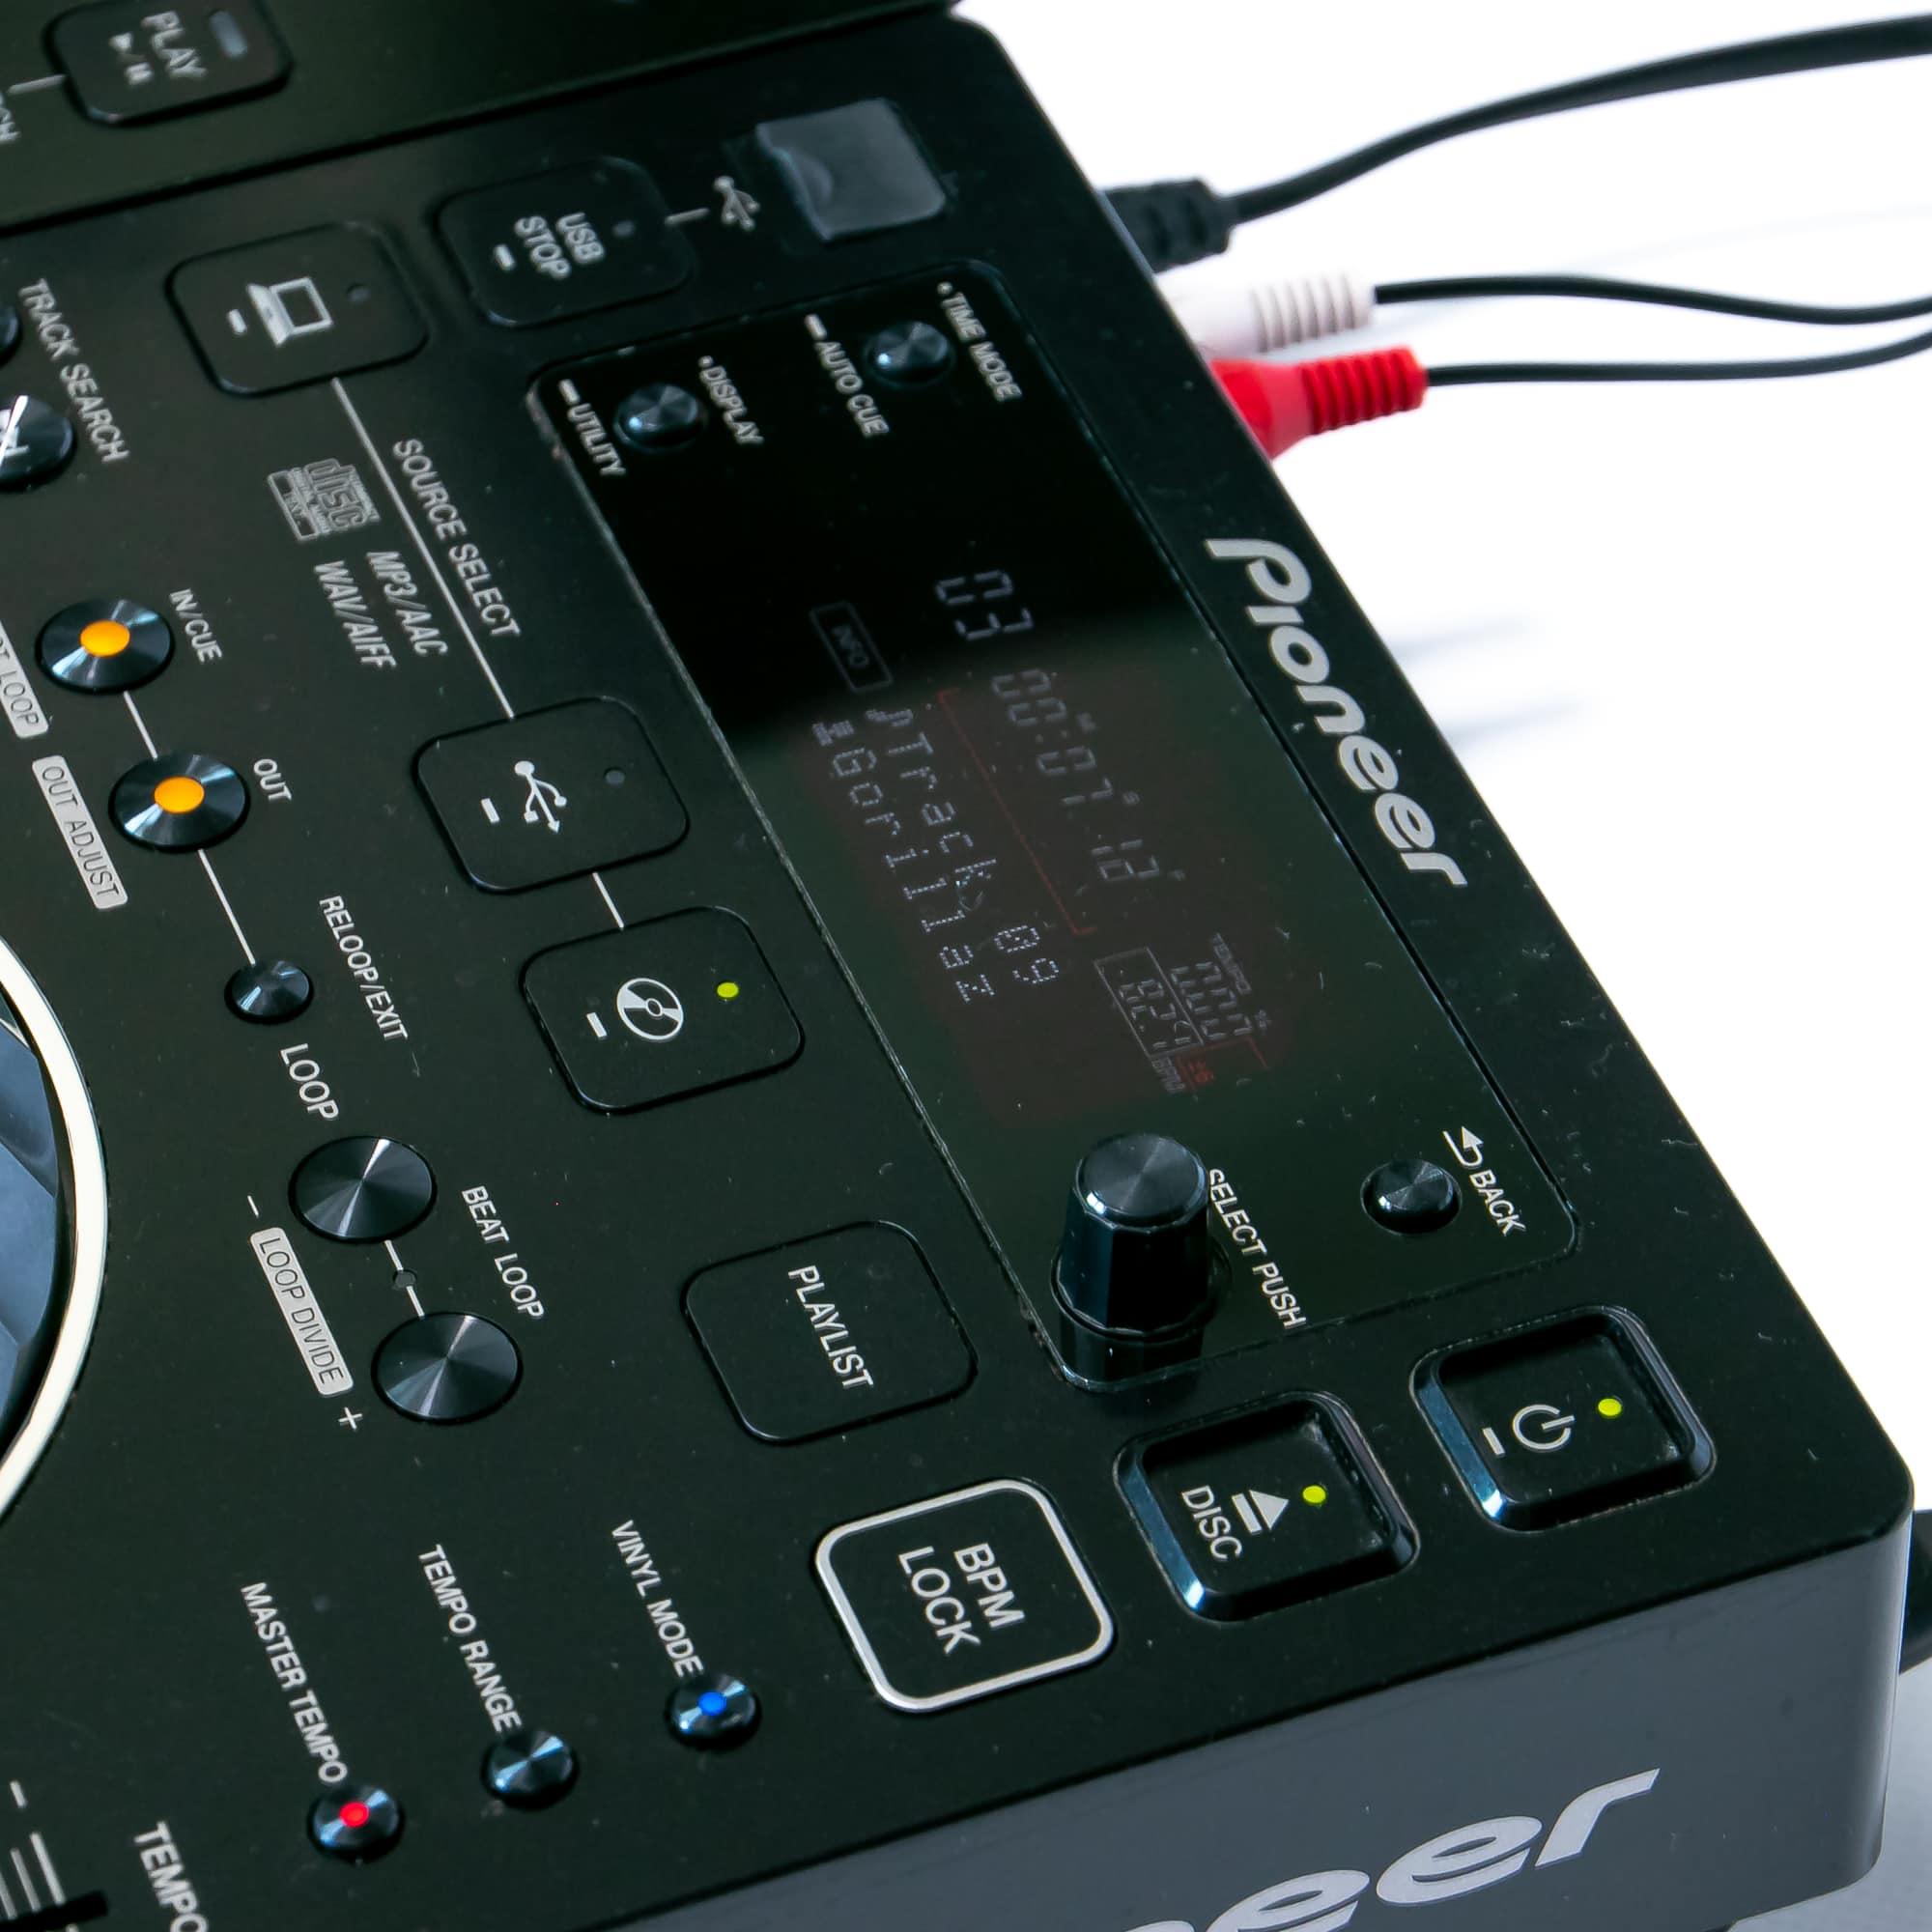 gebraucht kaufen DJ-Set: 2x Pioneer CDJ 350 + 1x Pioneer DJM 350